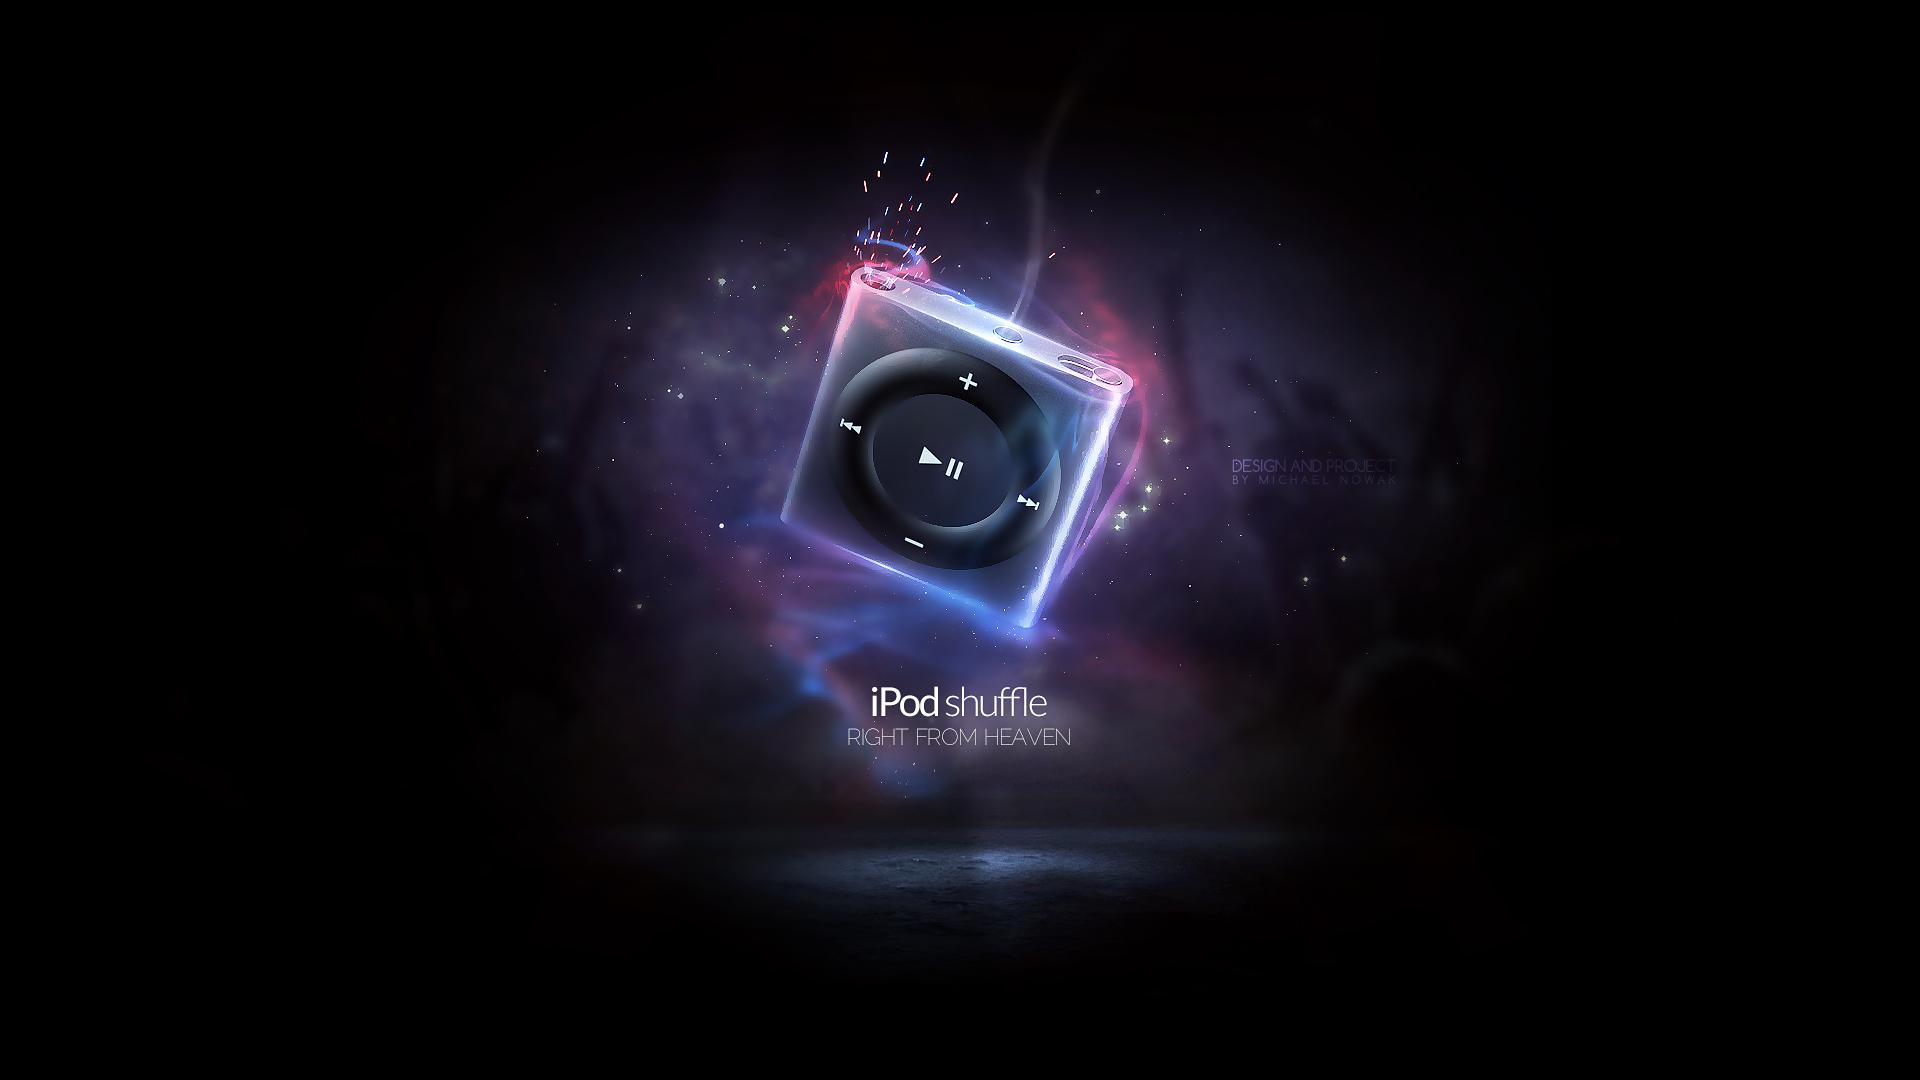 iPod Shuffle wallpaper by MichalNowak on DeviantArt